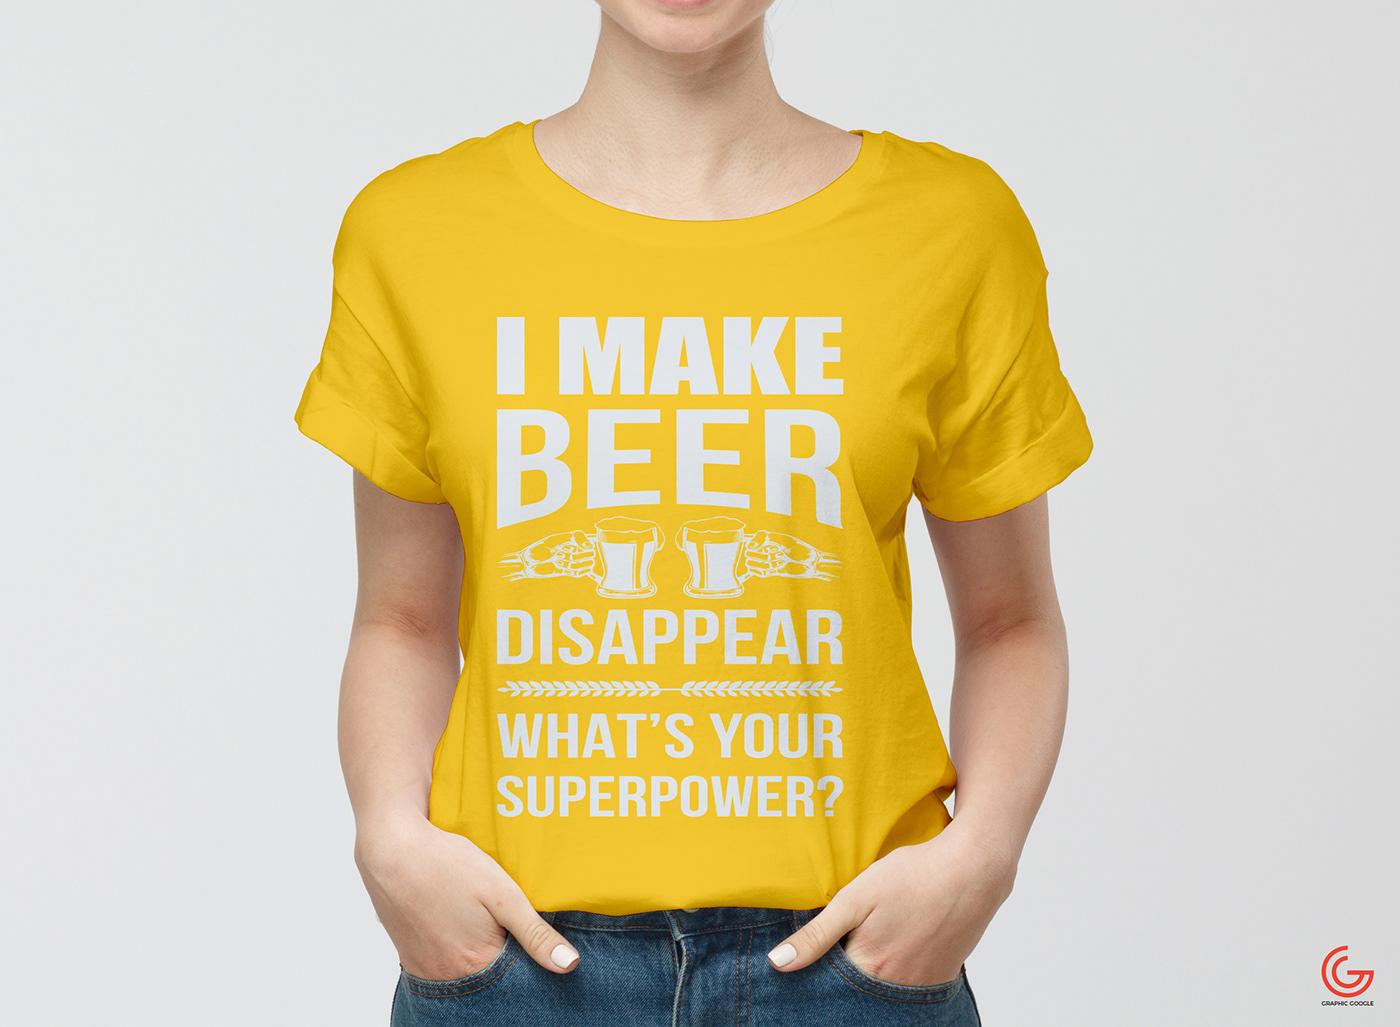 Image may contain: person, yellow and active shirt